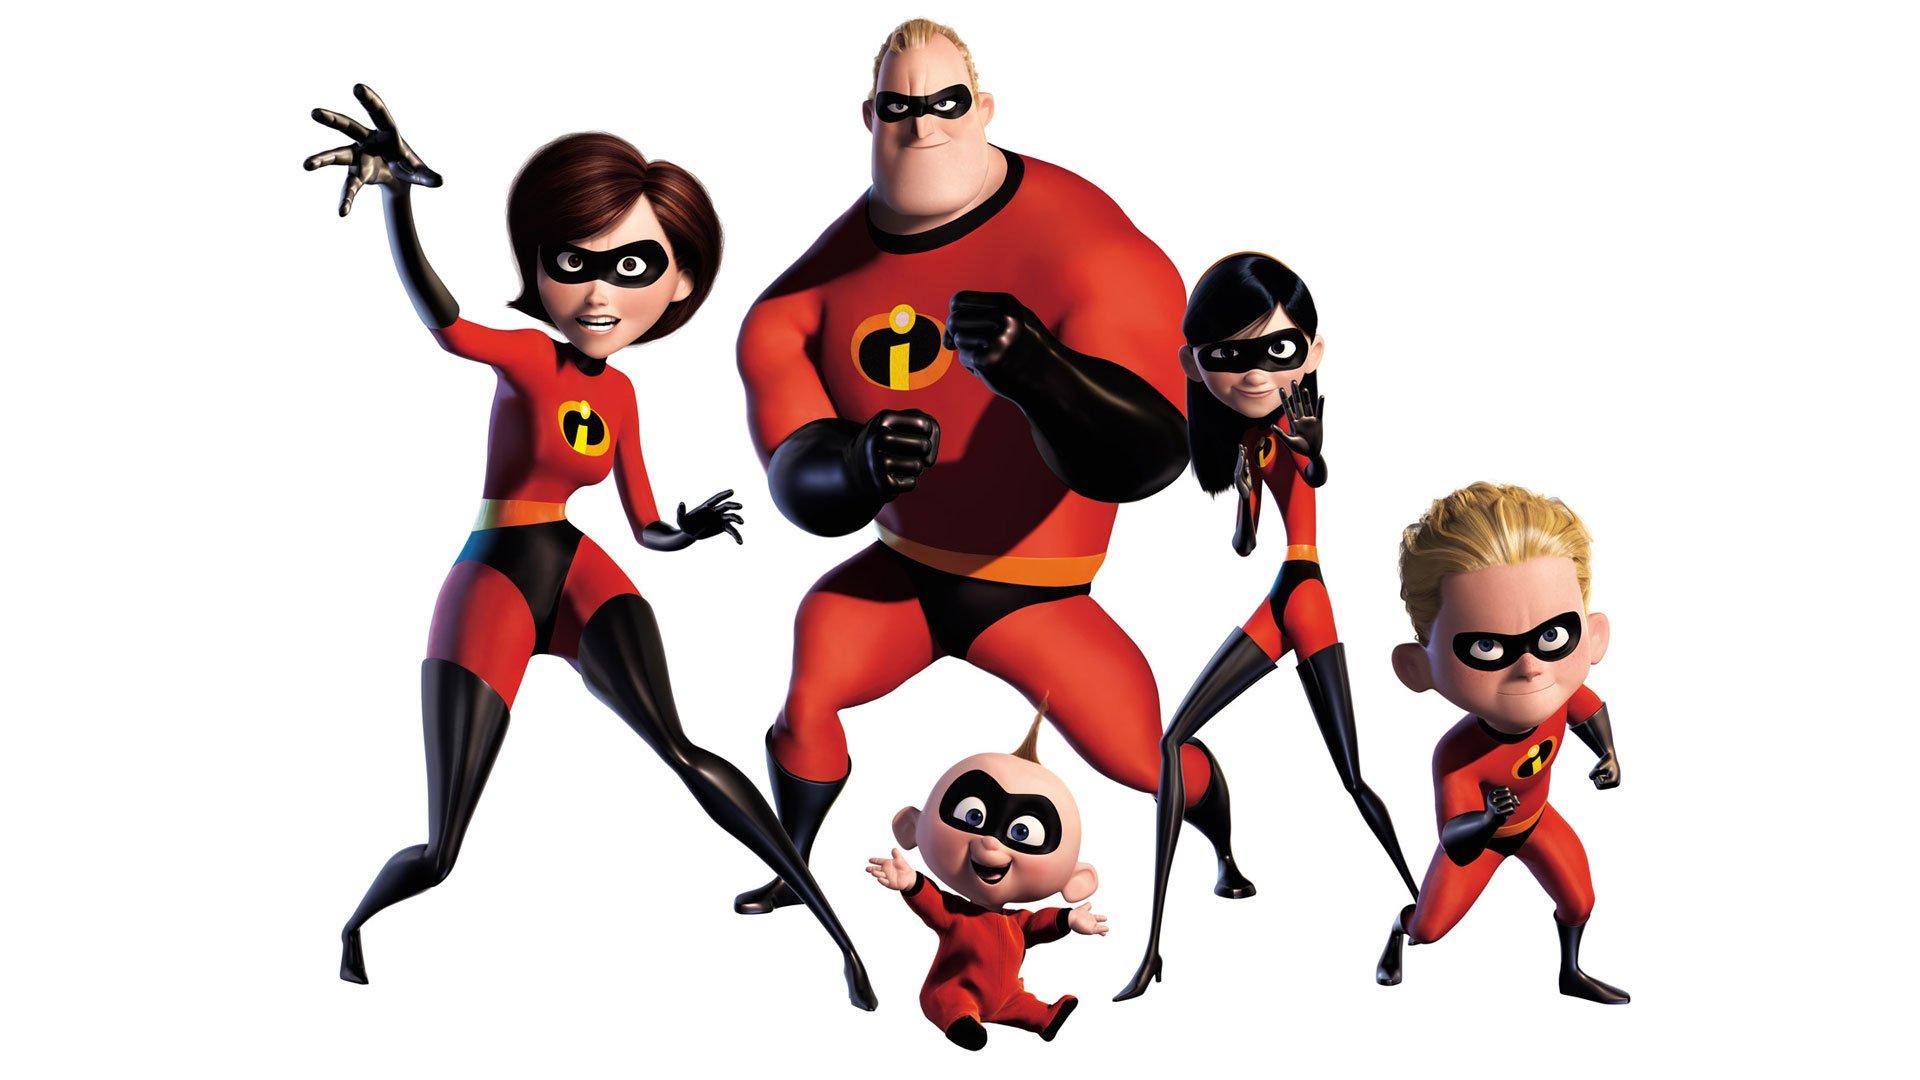 pixar redheads superheroes masks the incredibles elastigirl